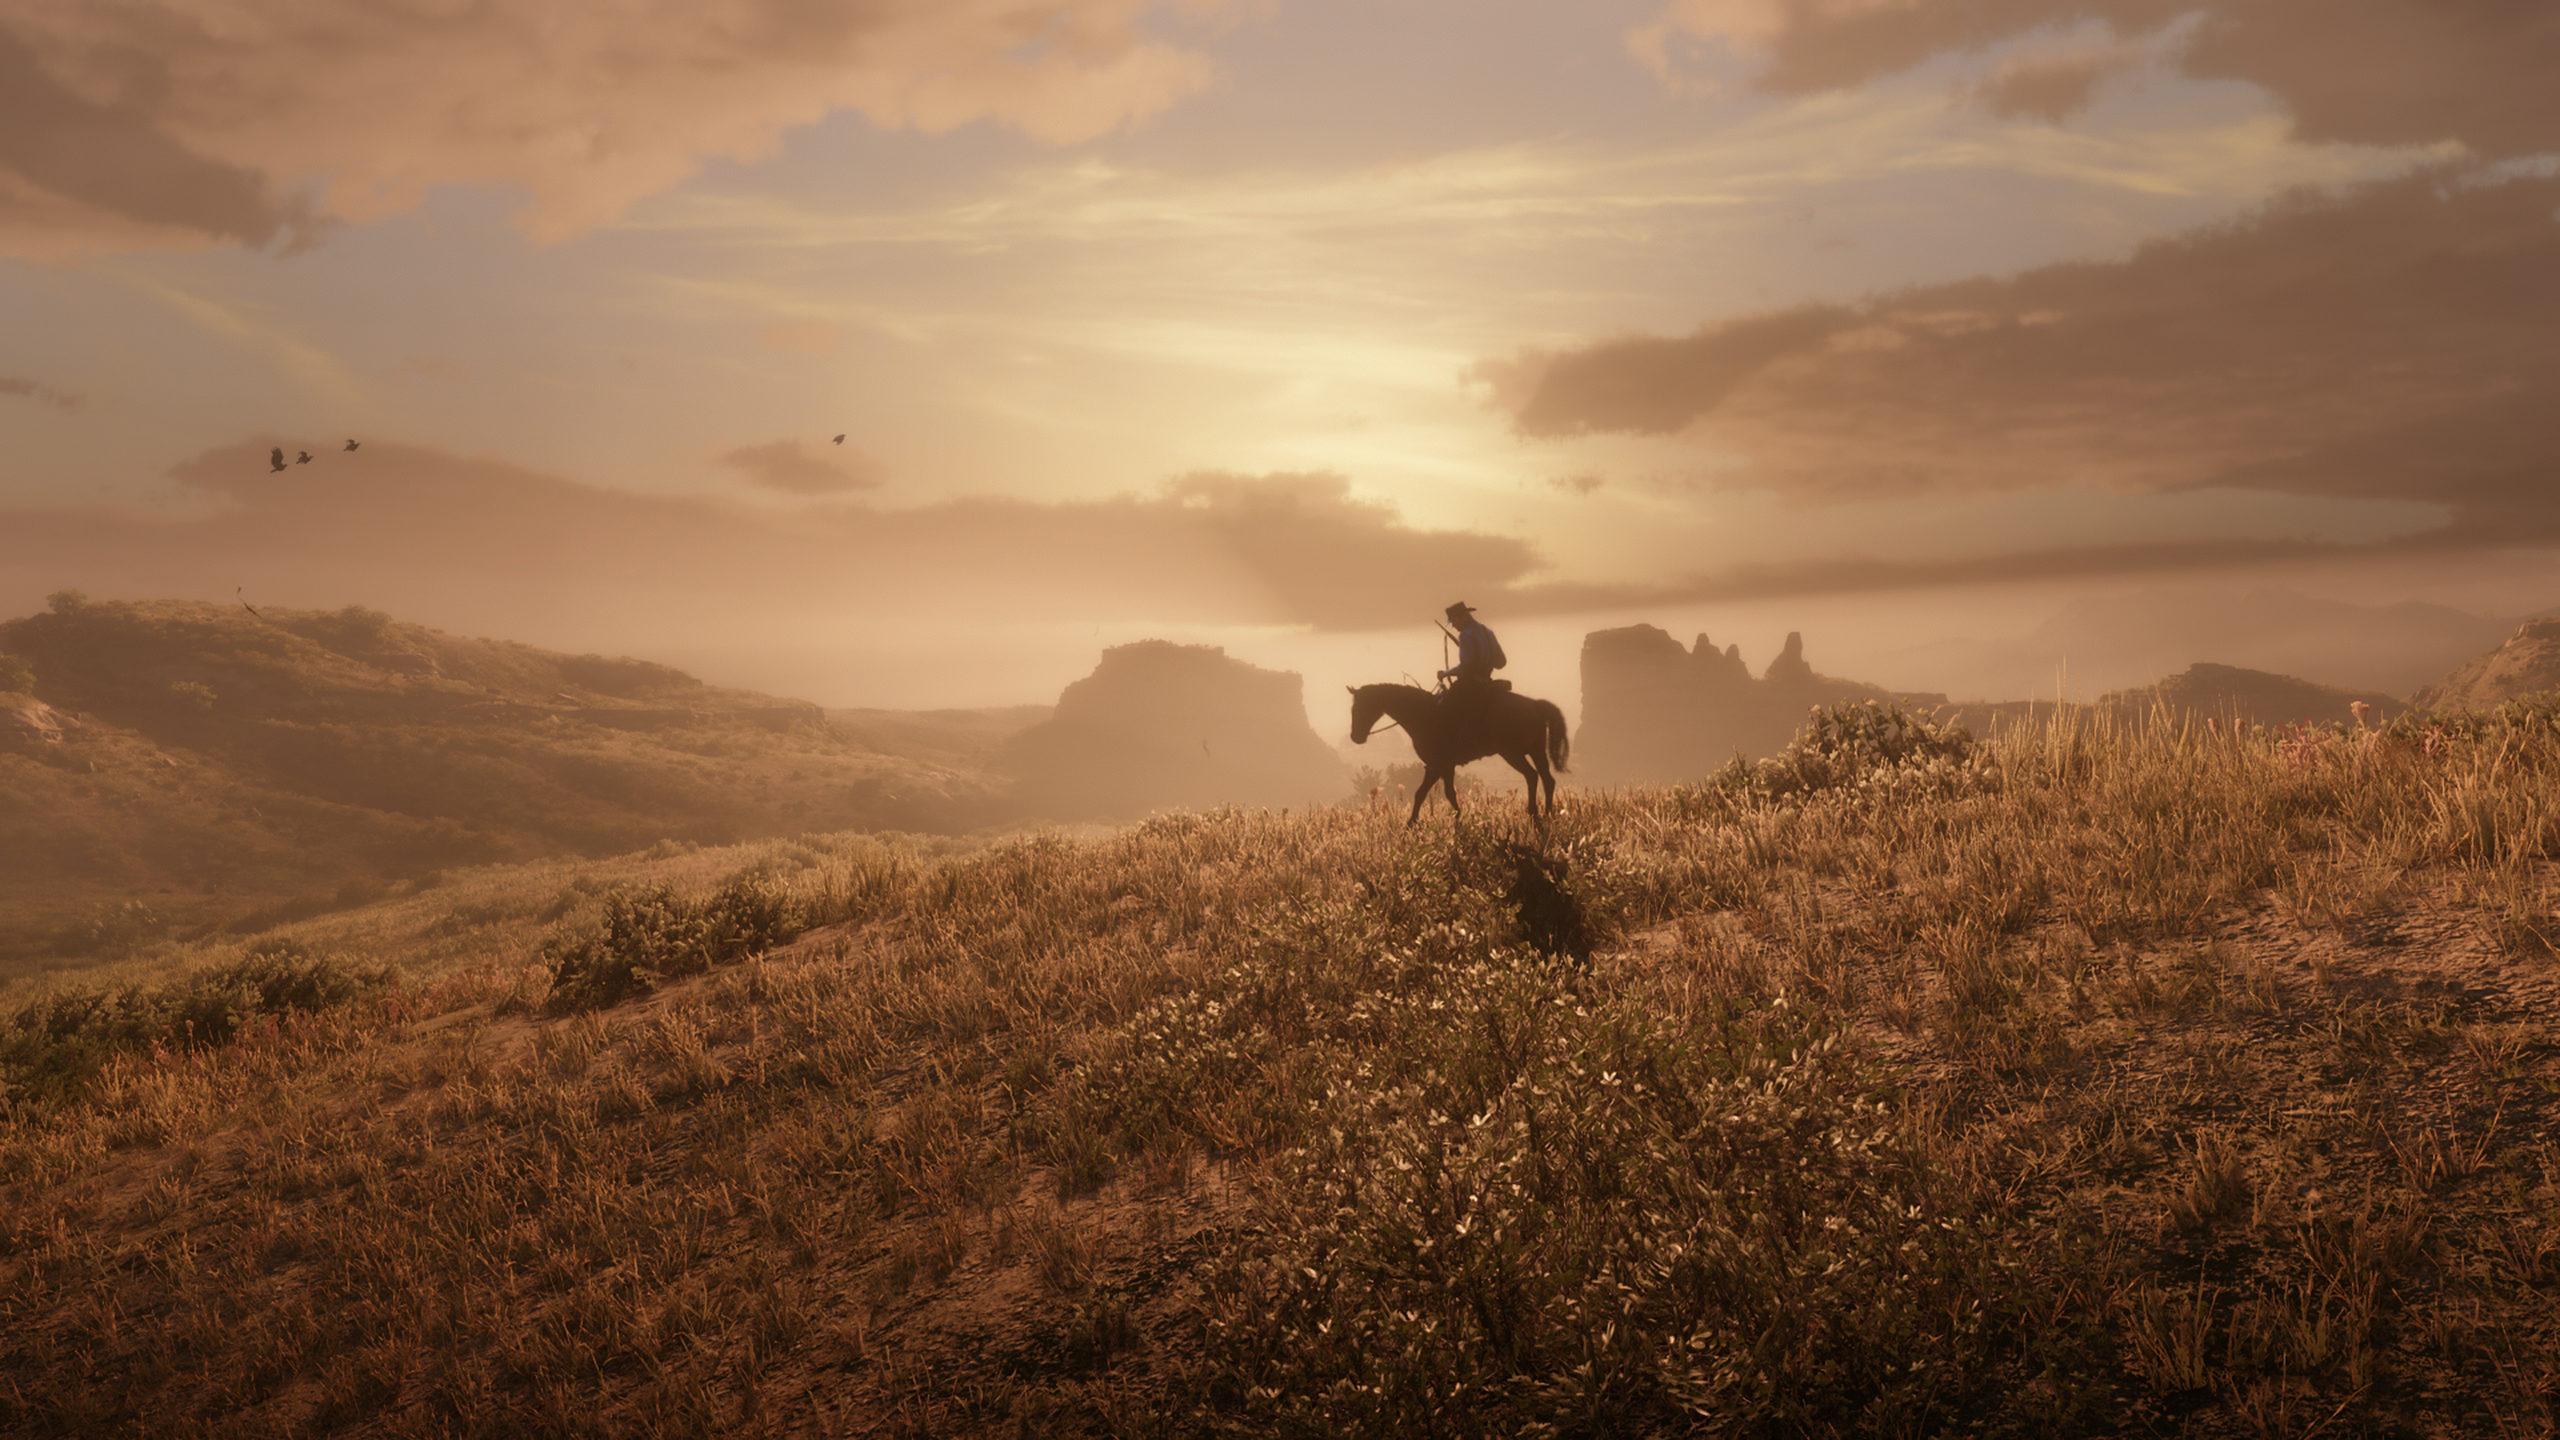 Red Dead Redemption 2 Wallpaper Free Download In 4k Resolution